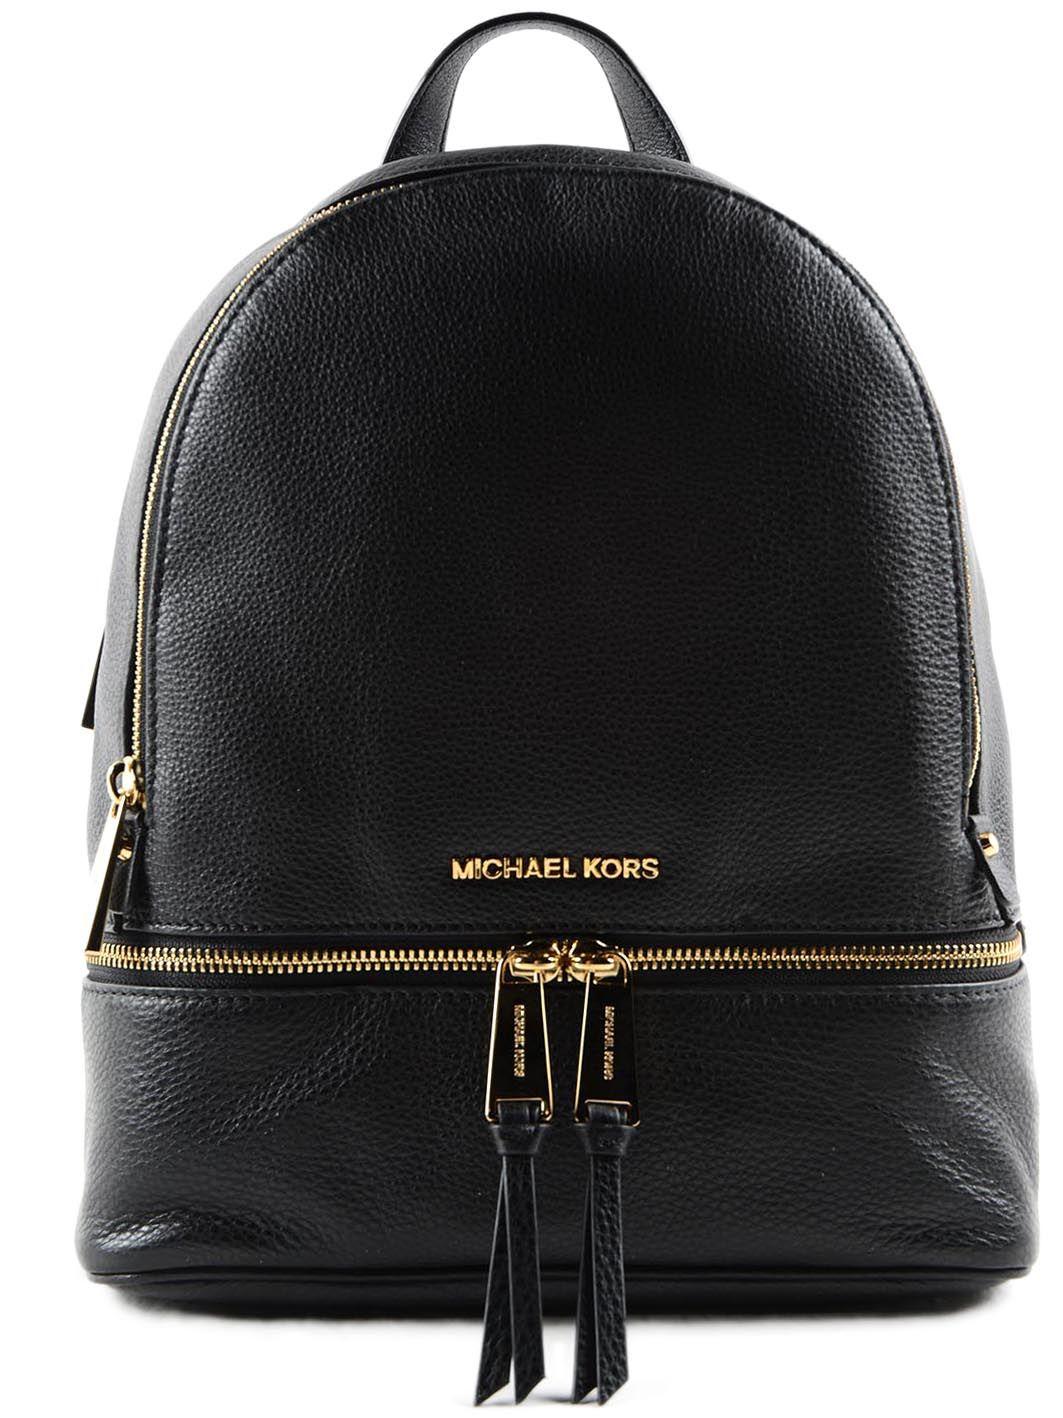 Michael Kors Medium Rhea Backpack